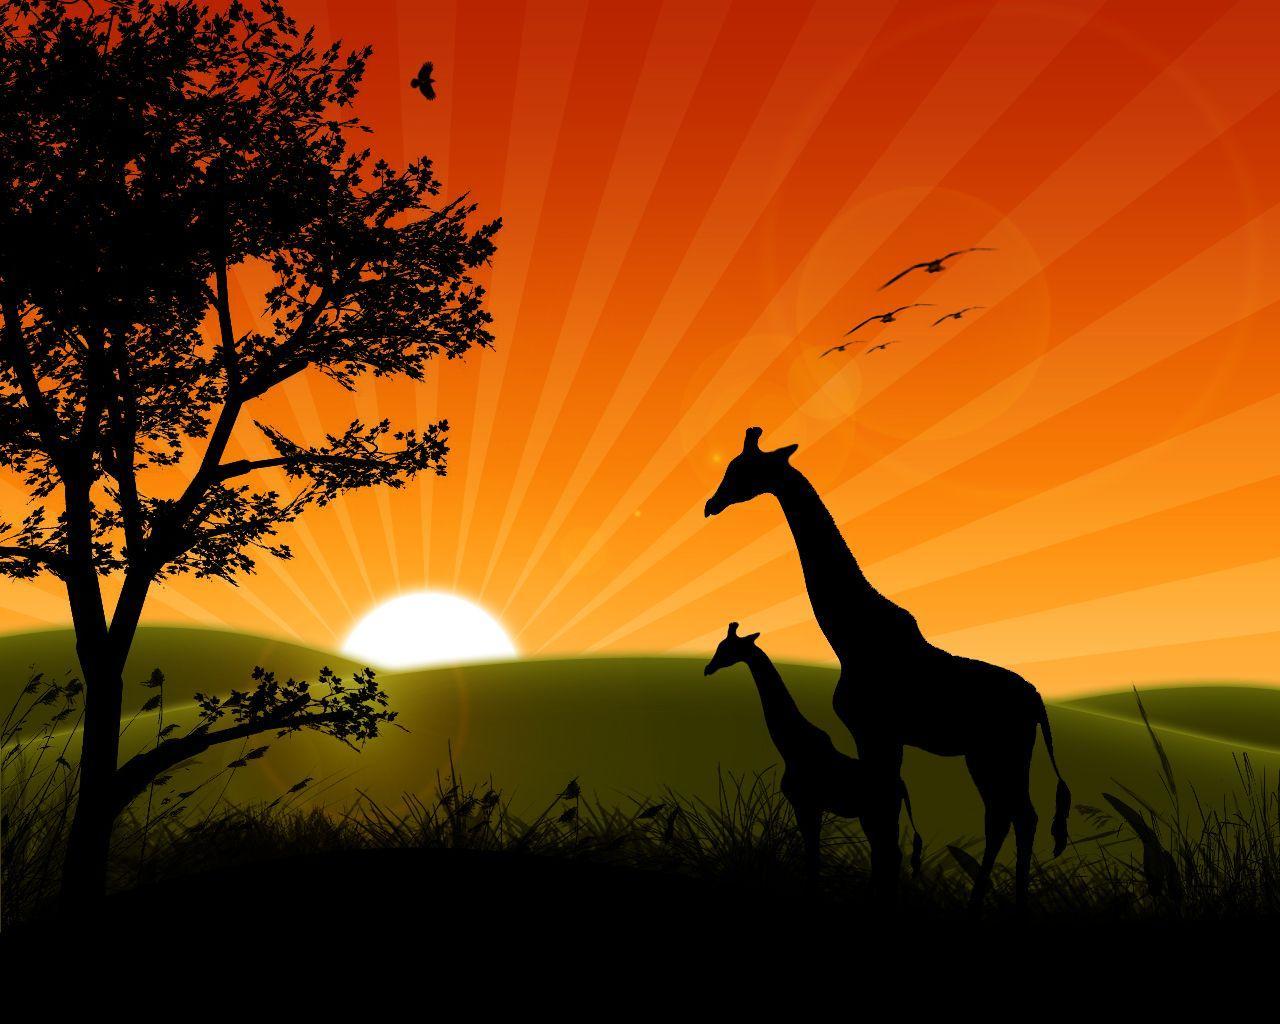 1280x1024 Rising Sun Wallpaper HD Space Wallpaper in Toplist 1280x1024